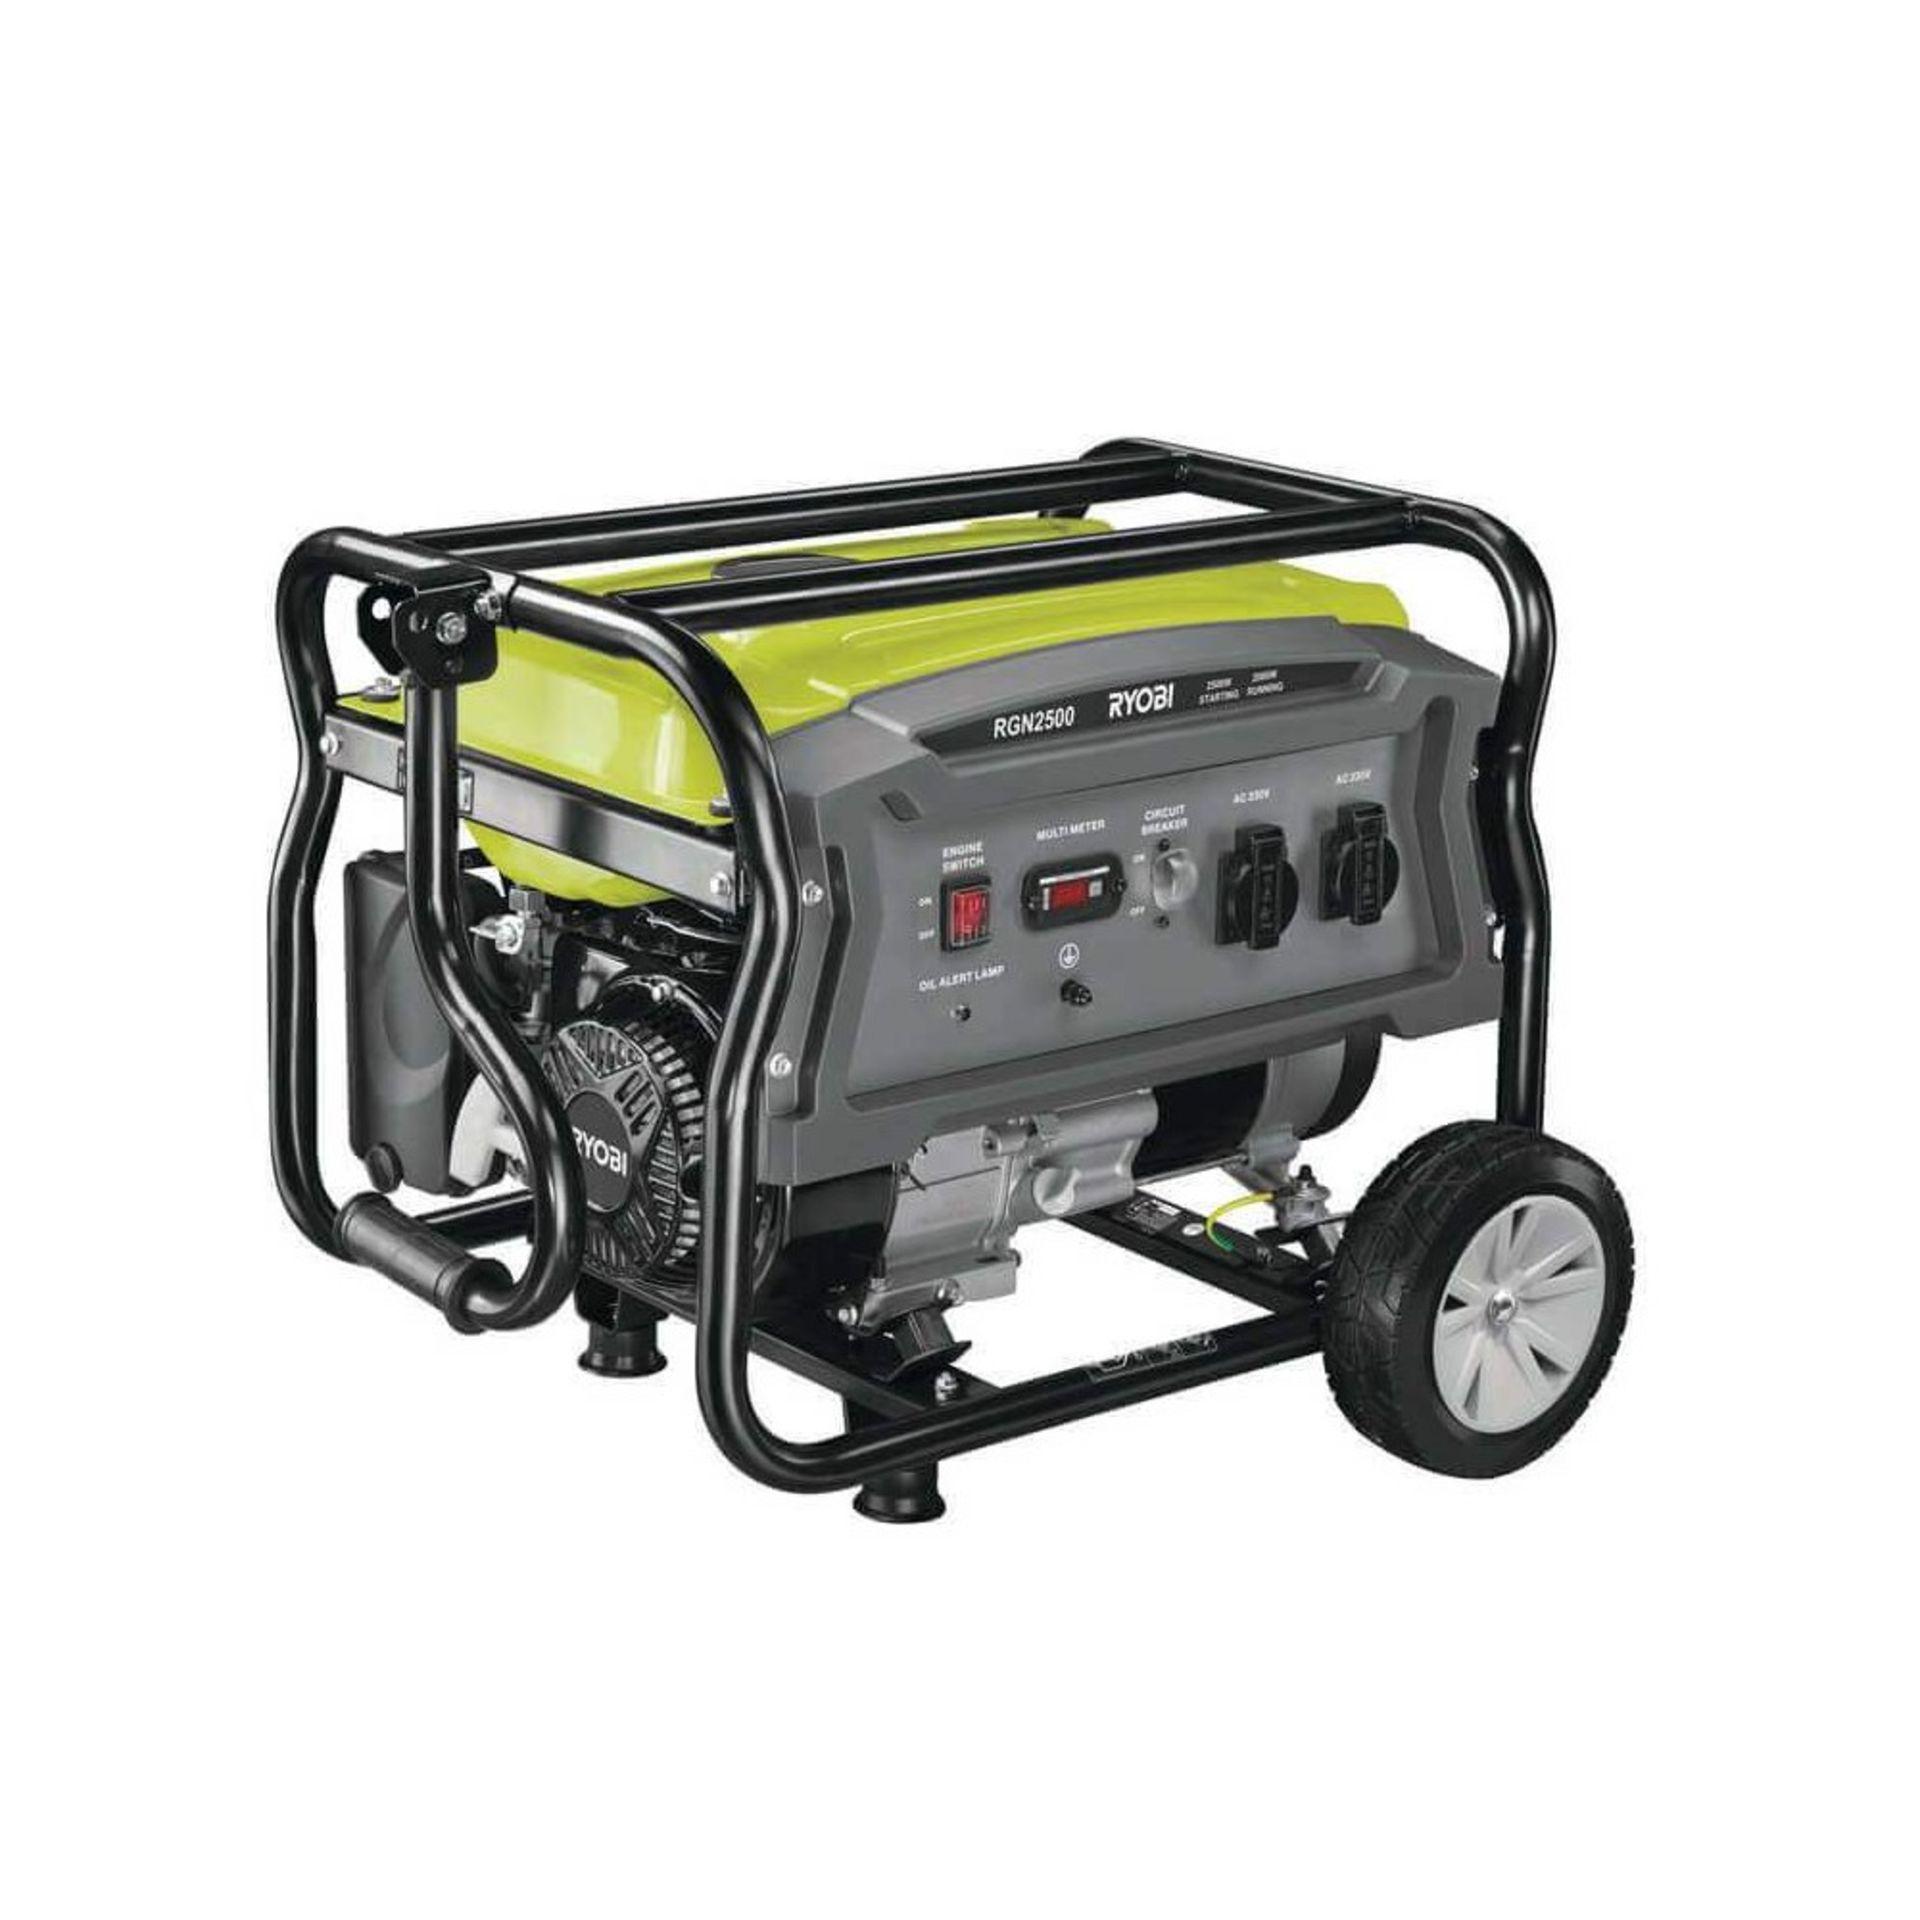 Lot 59054 - V Brand New Ryobi RGN 2500 Generator On Wheels - 208cc - 2.5Kva RRP £399